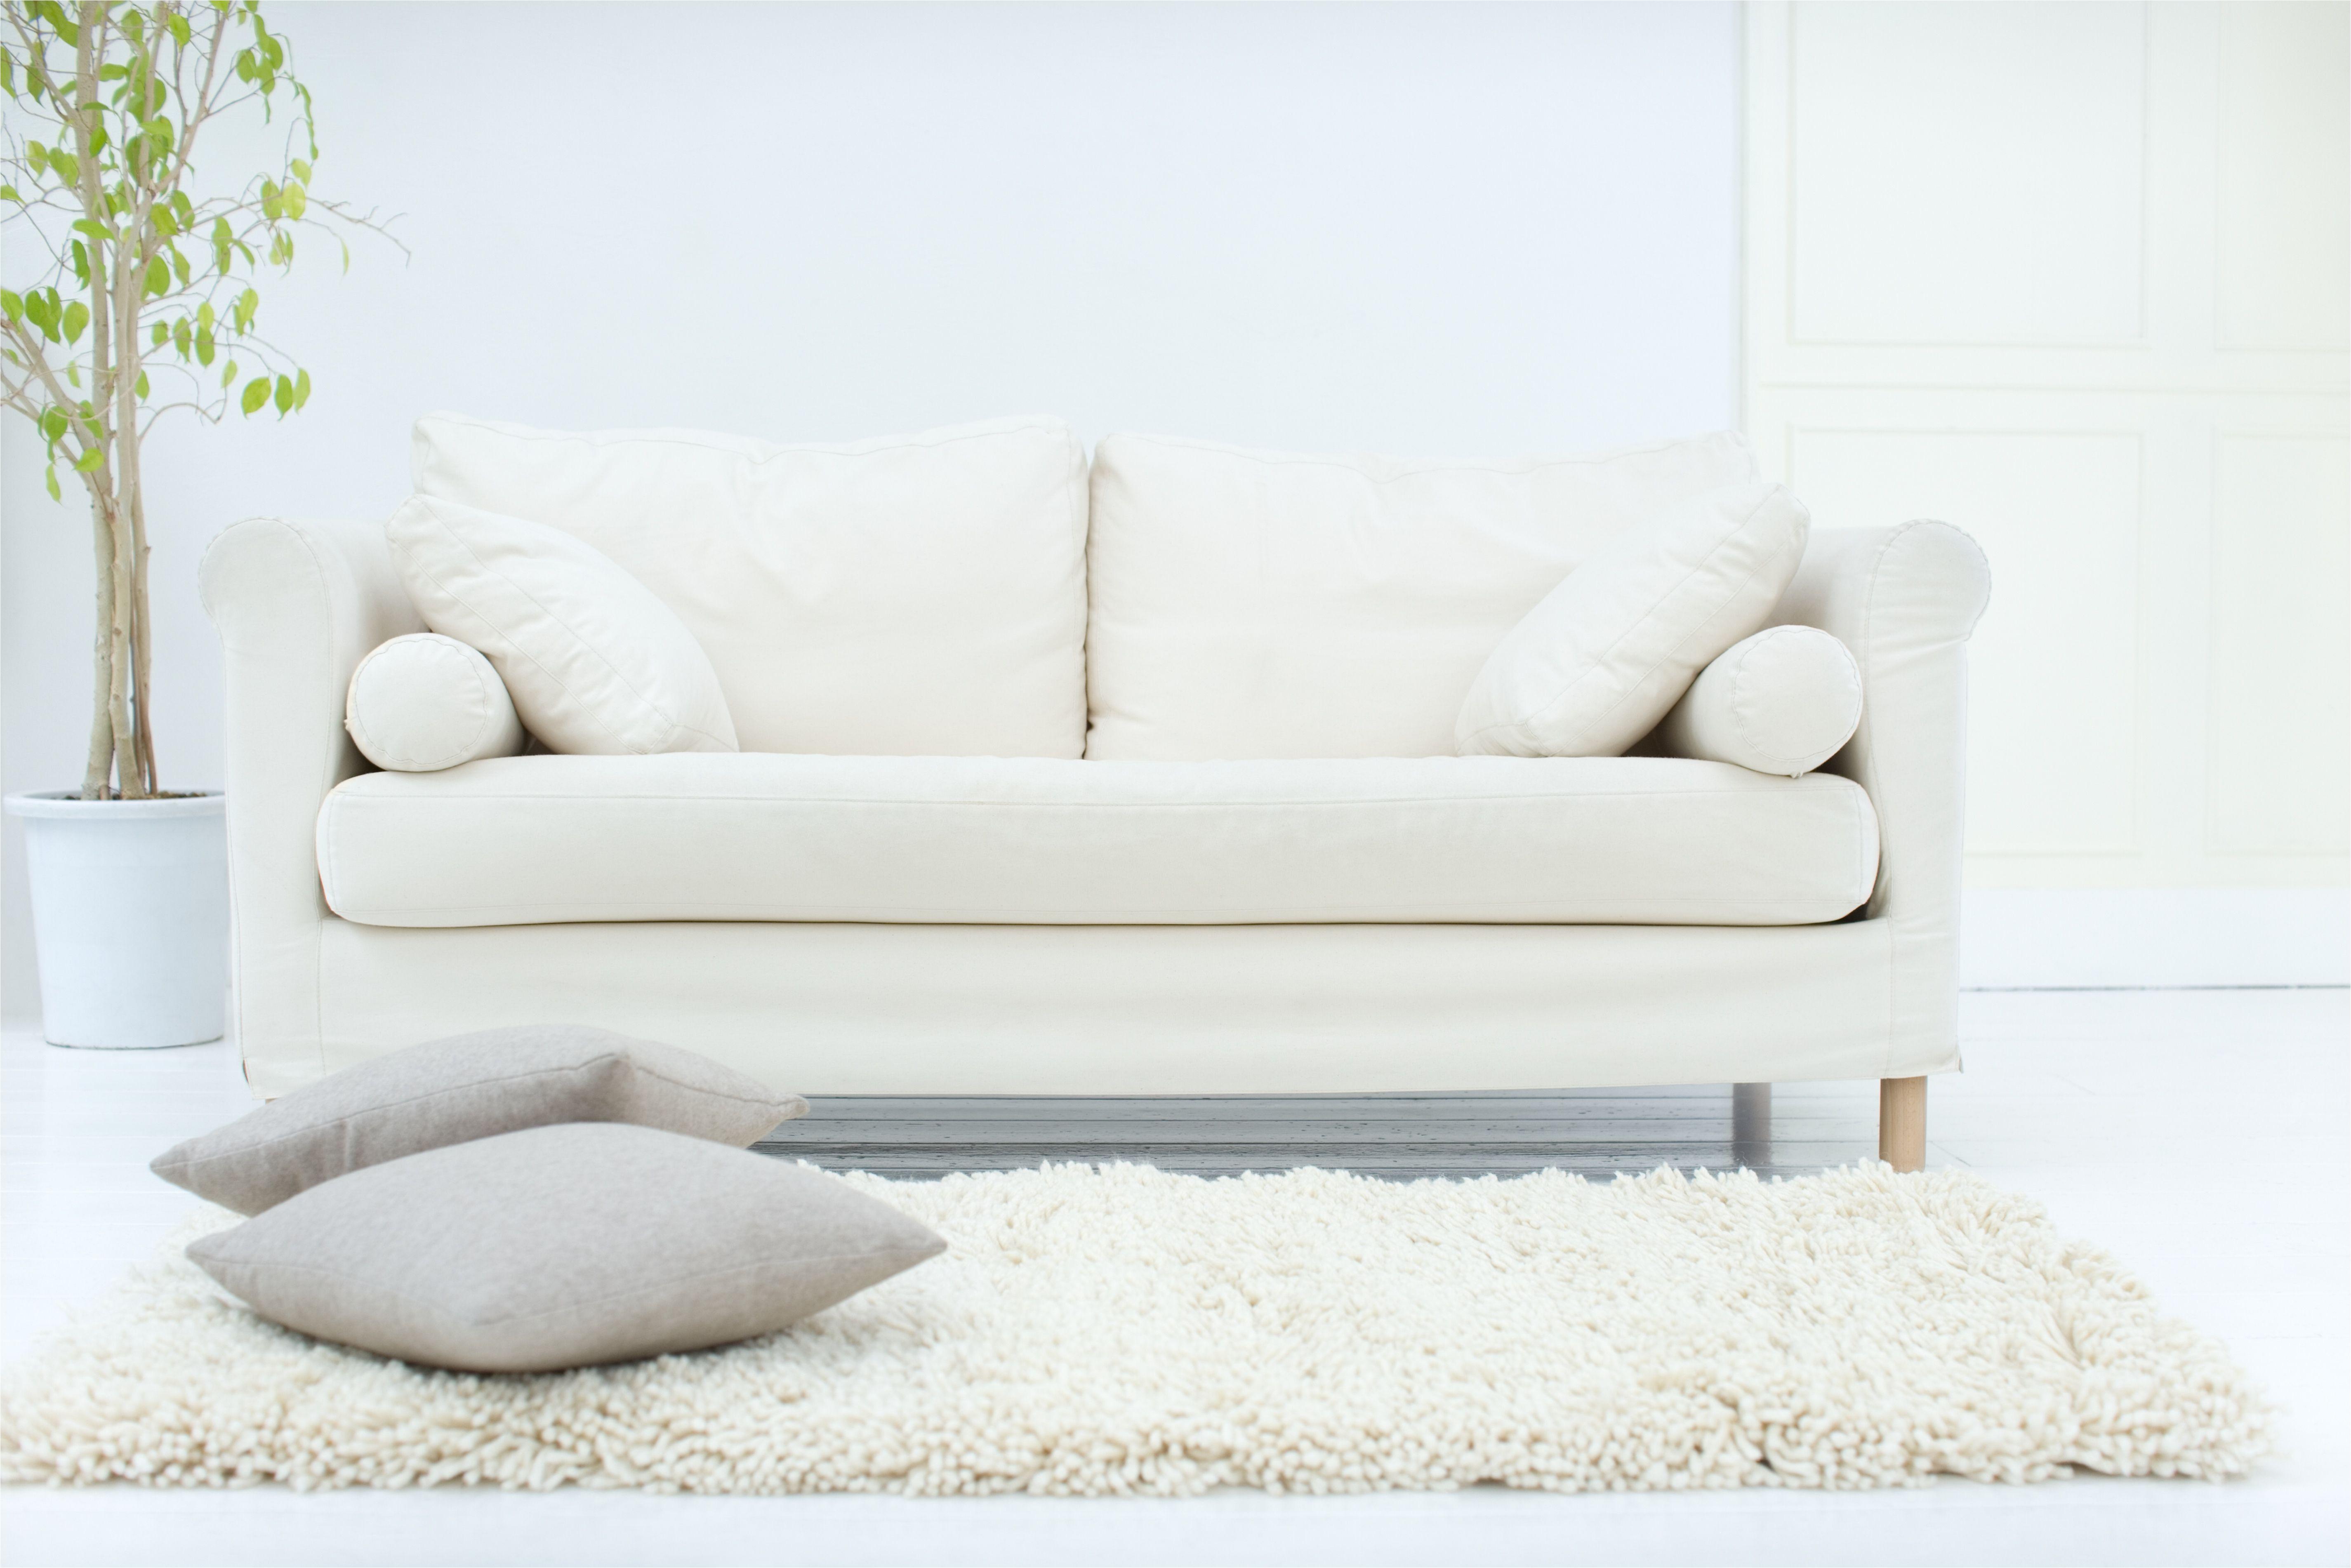 stylish living room 71916117 5a71f6623de4230038992b2f jpg